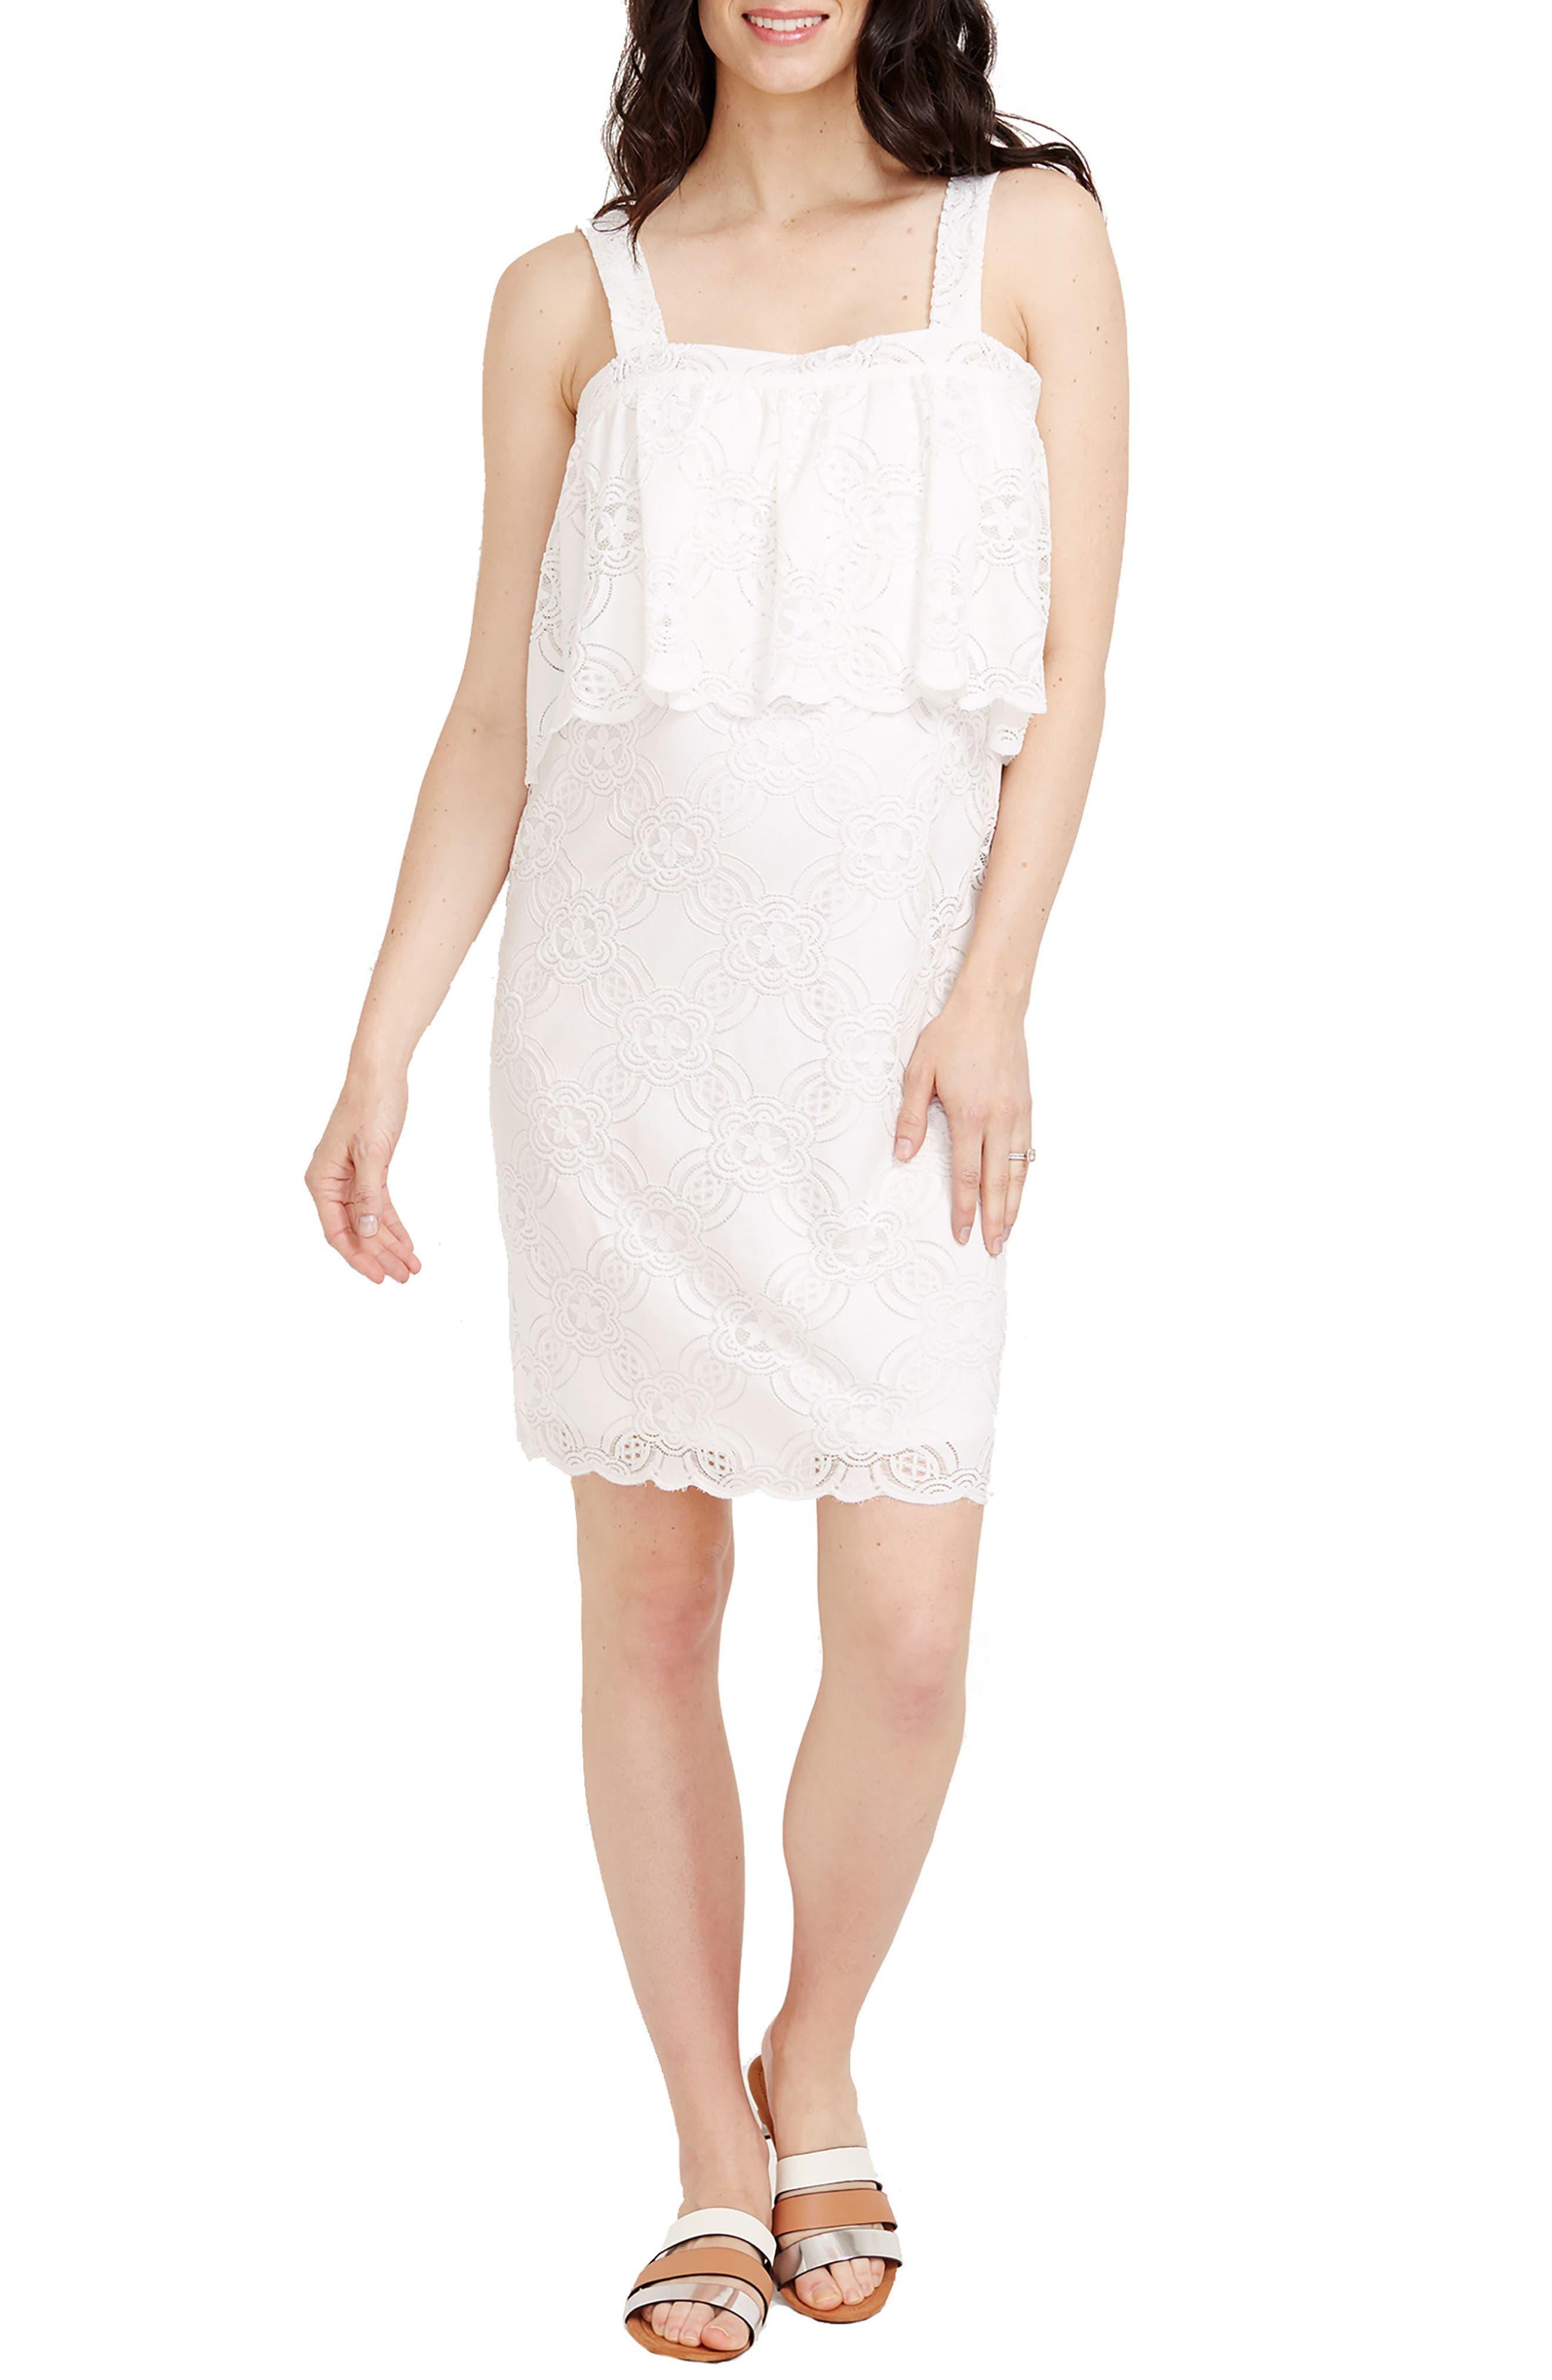 Rosie Pope Mia Maternity Dress, Ivory